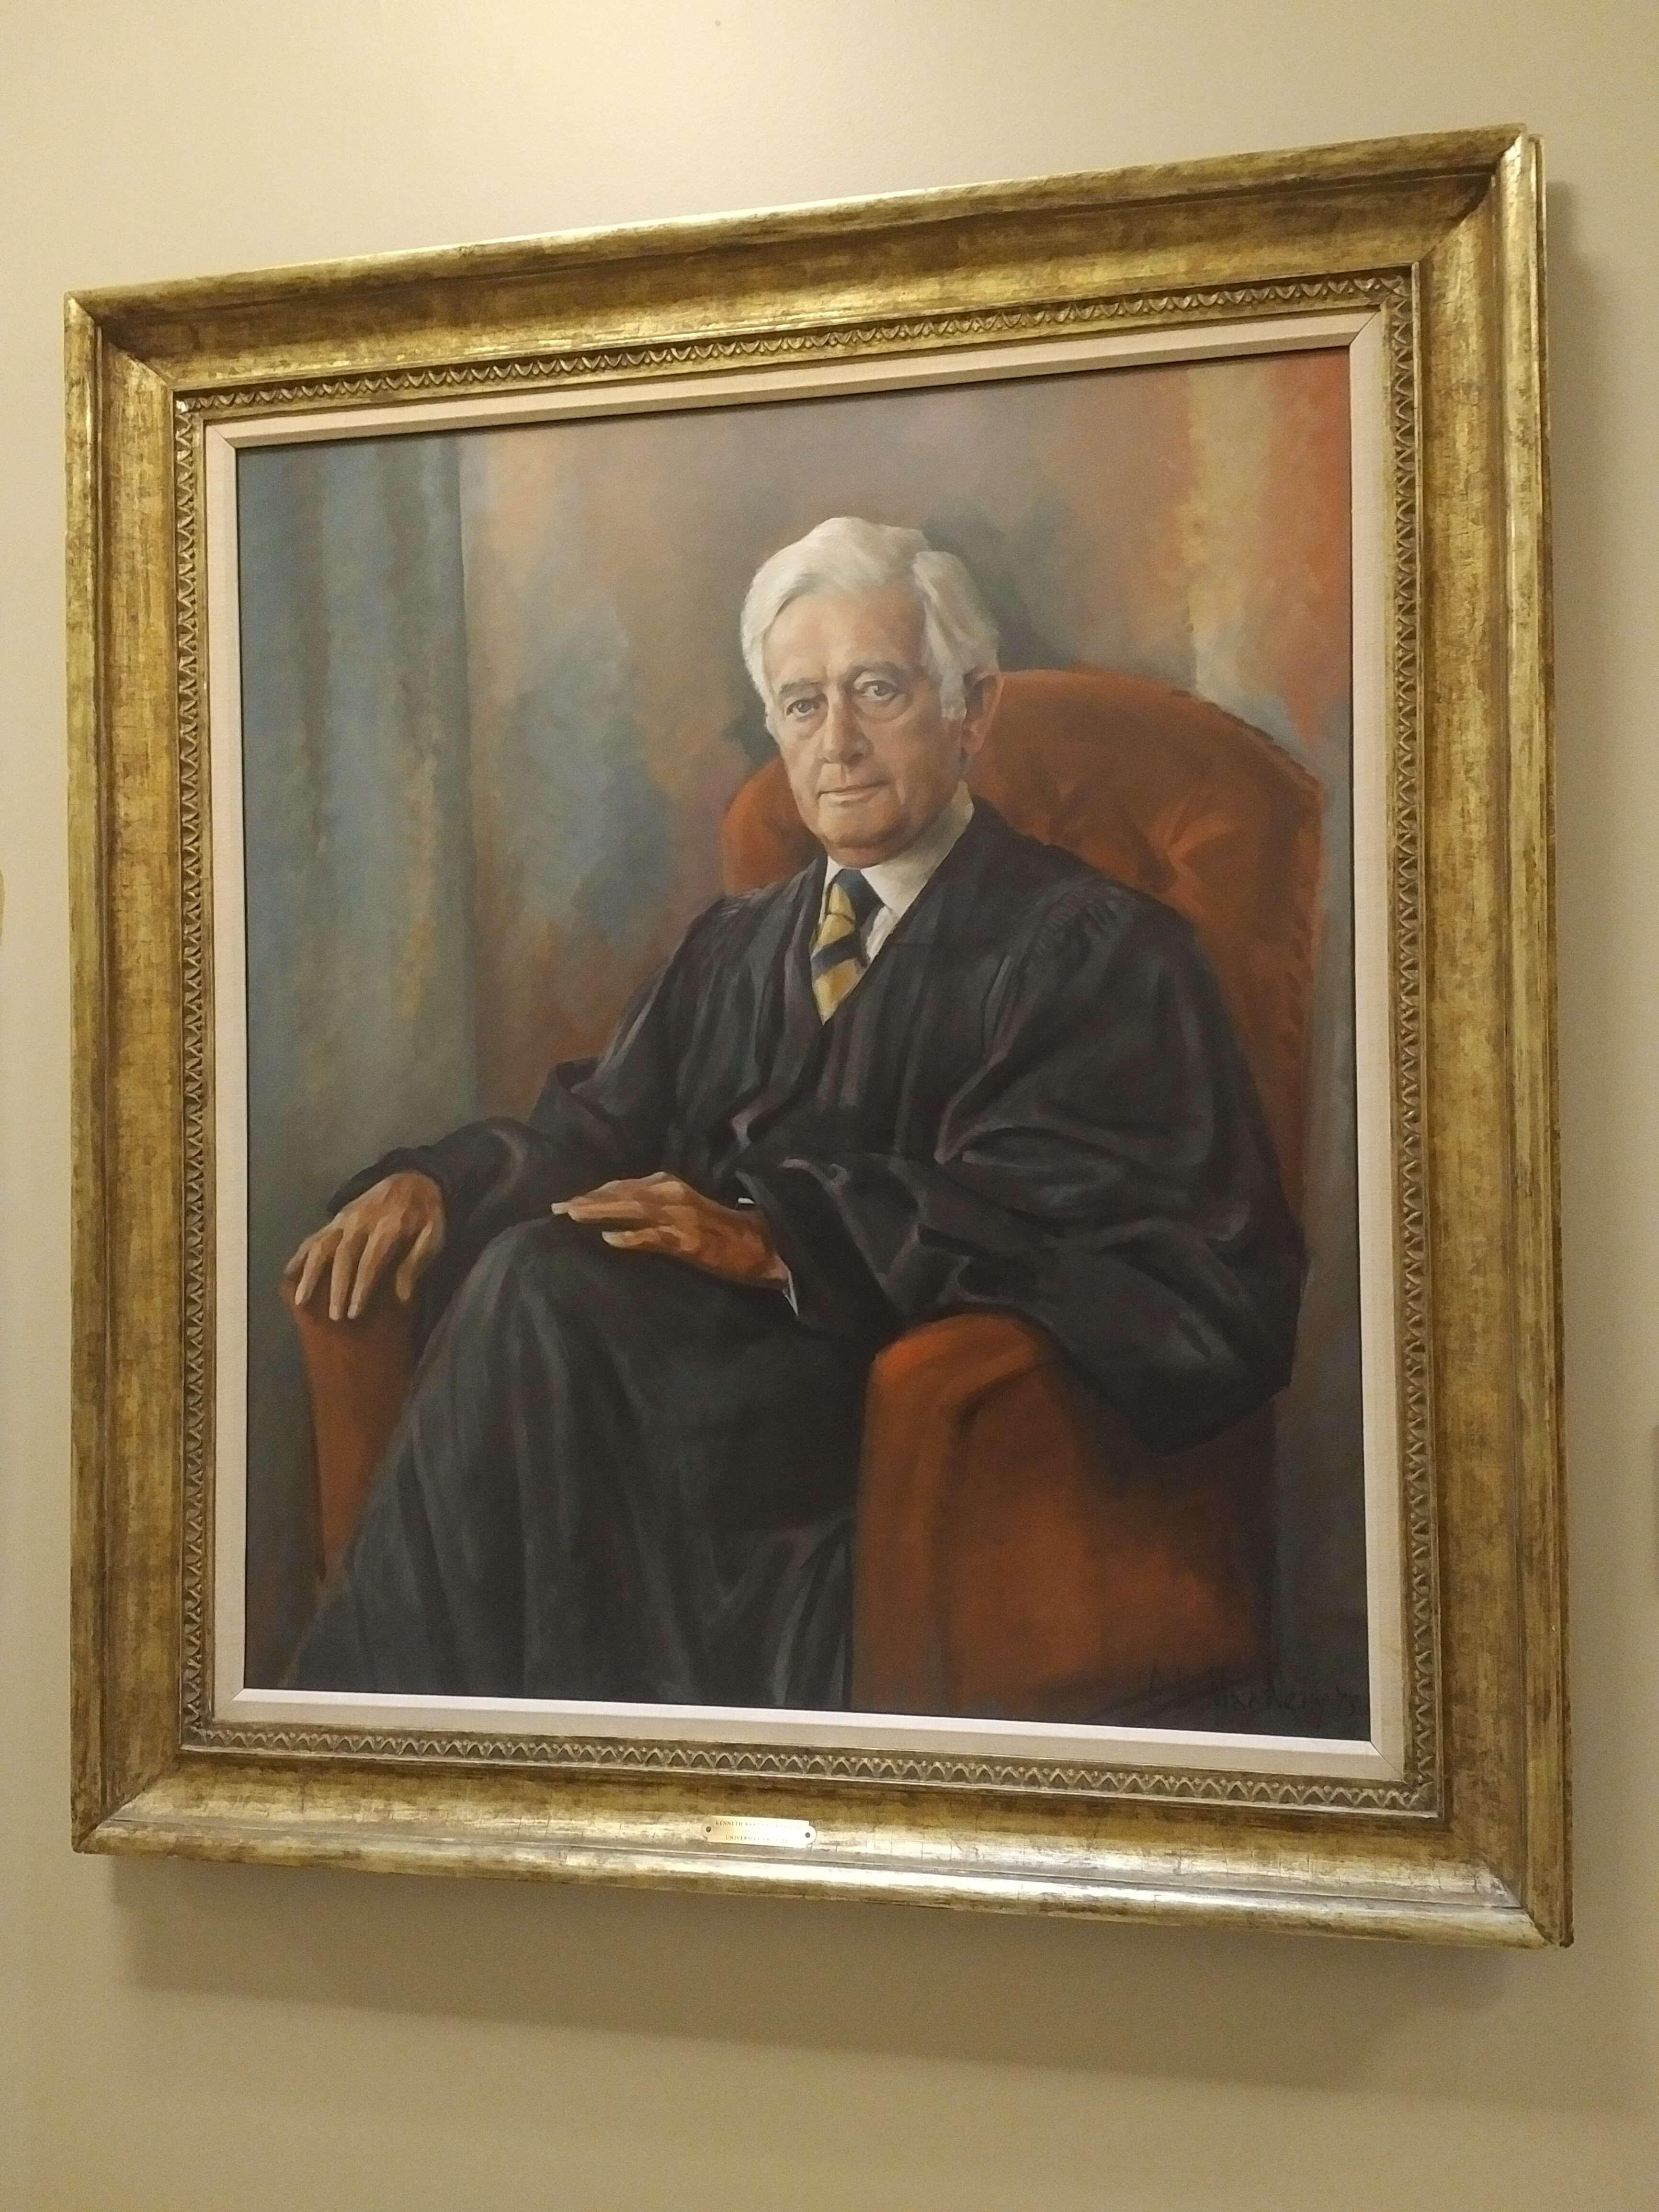 Senator Keating